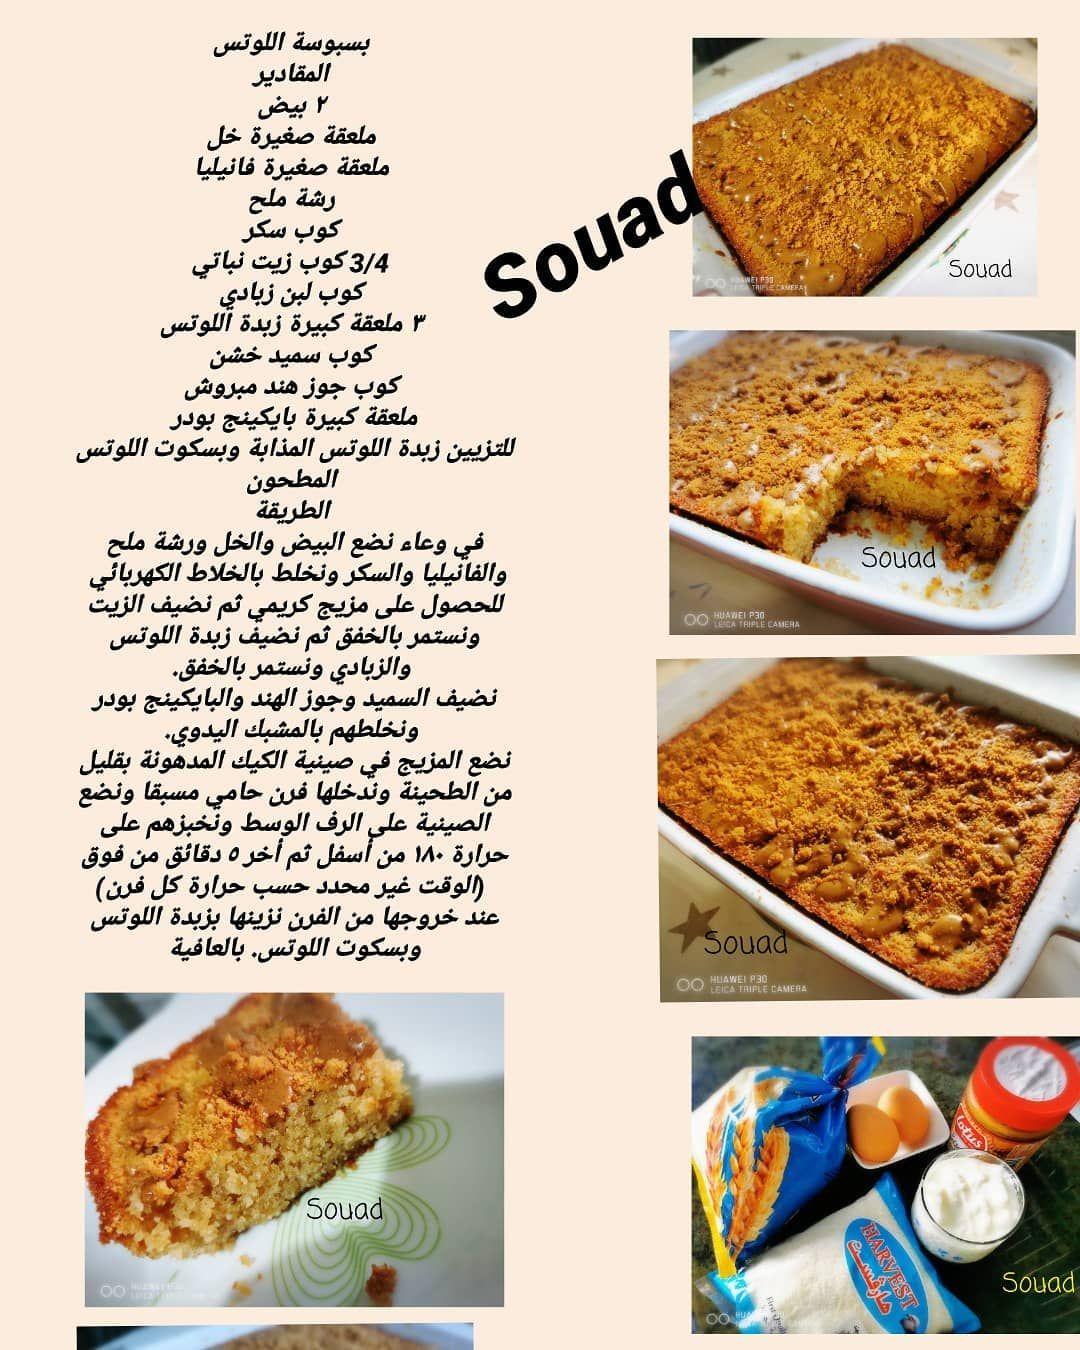 Souad Hosna Shared A Photo On Instagram بسبوسة اللوتس رهيبة طعما ومضمونا طبخات لذيذة اطباقي لذيذ اكلاتي طبخات لذيذة اطباقي Food Banana Bread Desserts